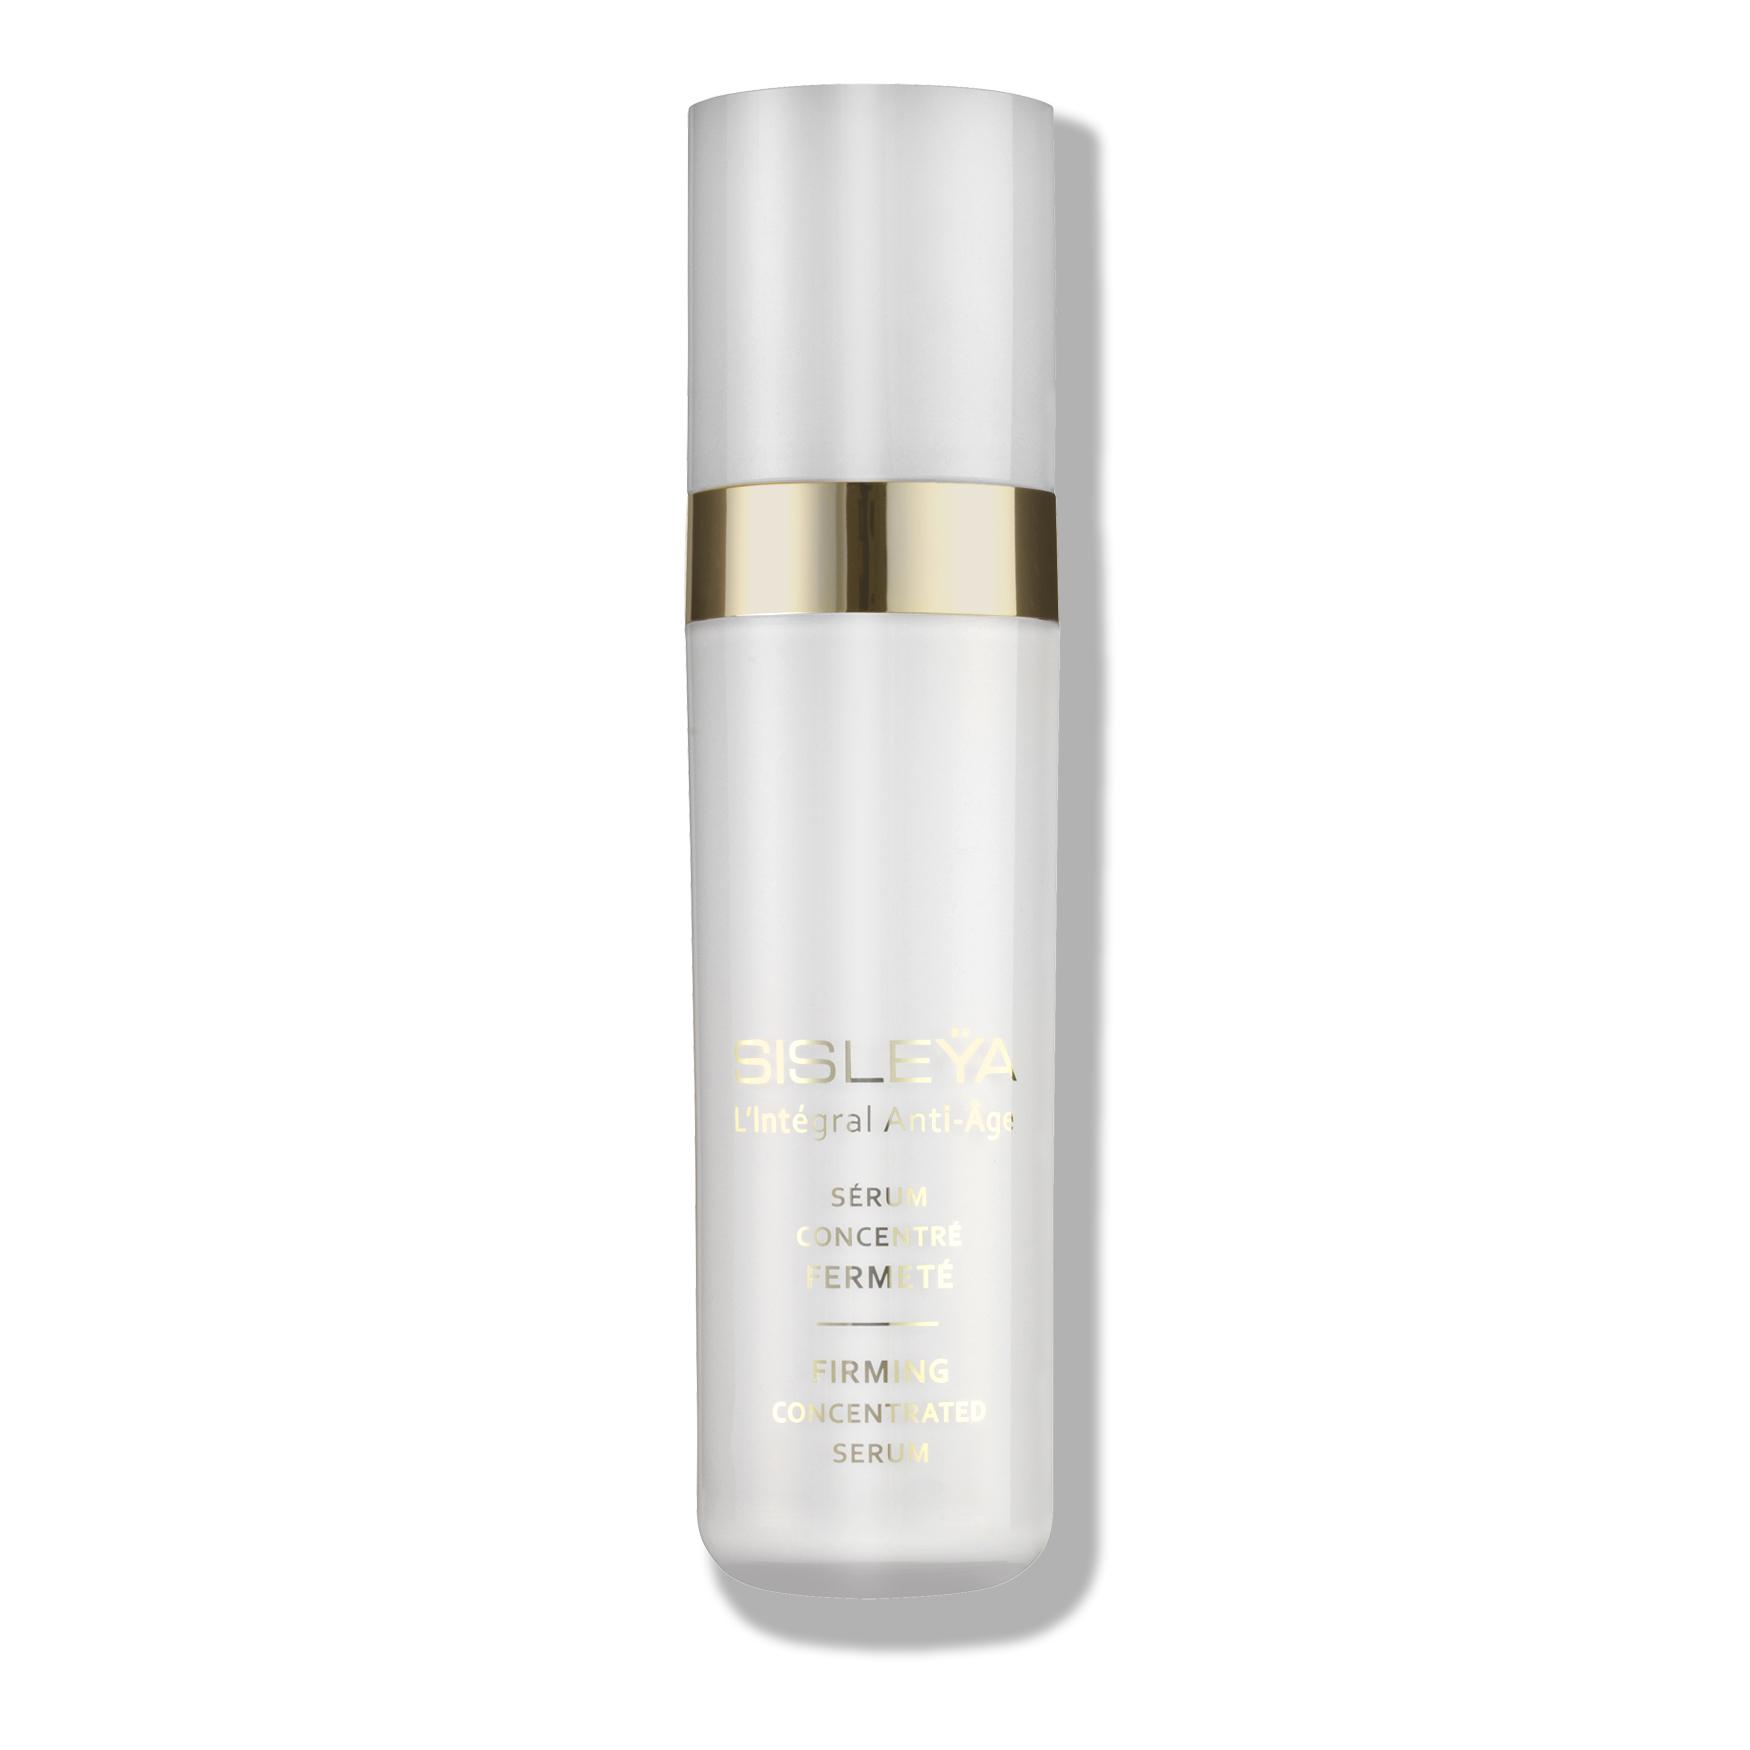 SISLEY | Sisleÿa L'int Égral Anti-Wrinkle Concentrated Serum